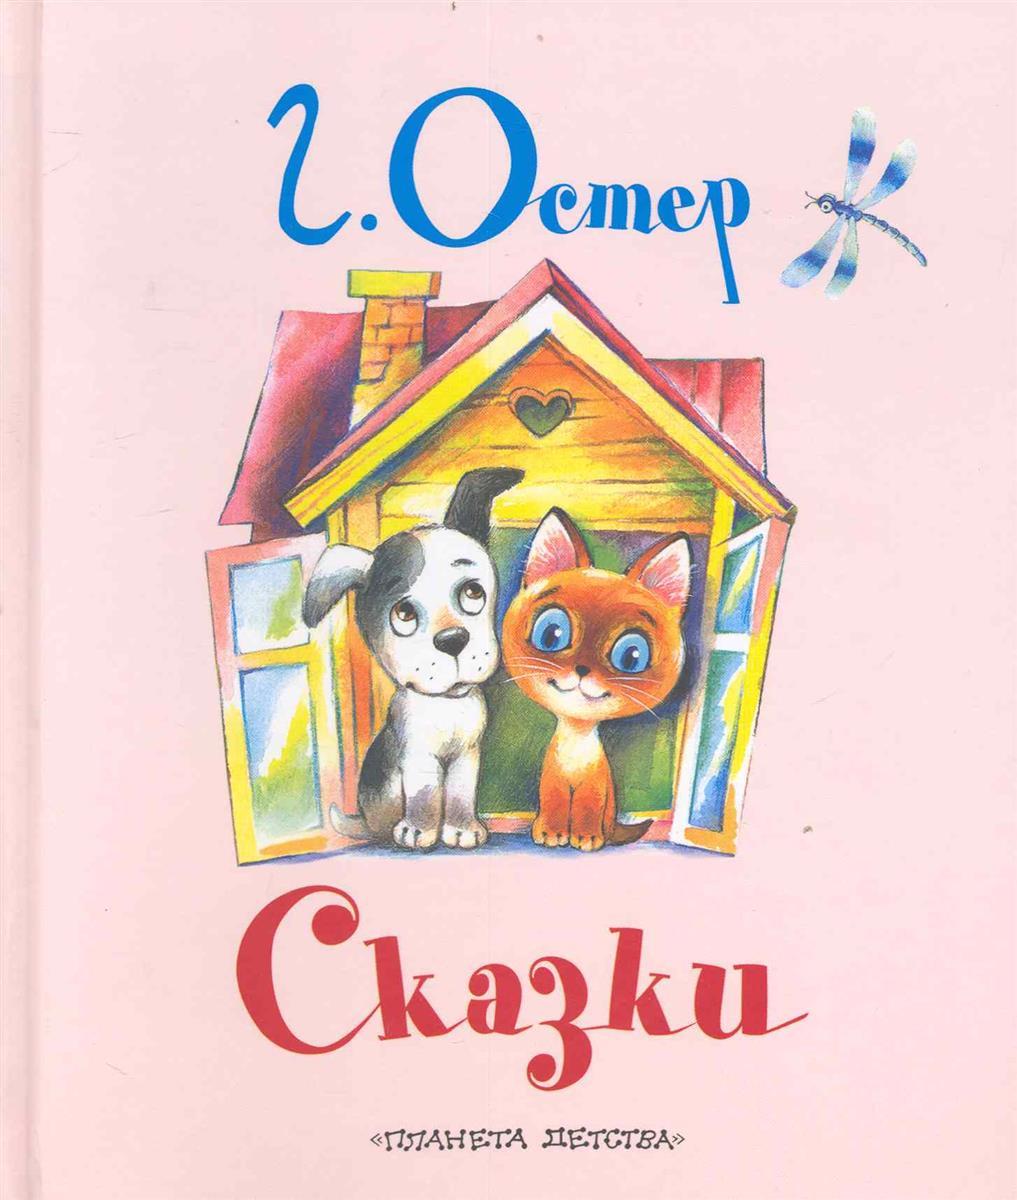 Остер Г. Остер Сказки ISBN: 9785170642458 остер г б самые разные сказки